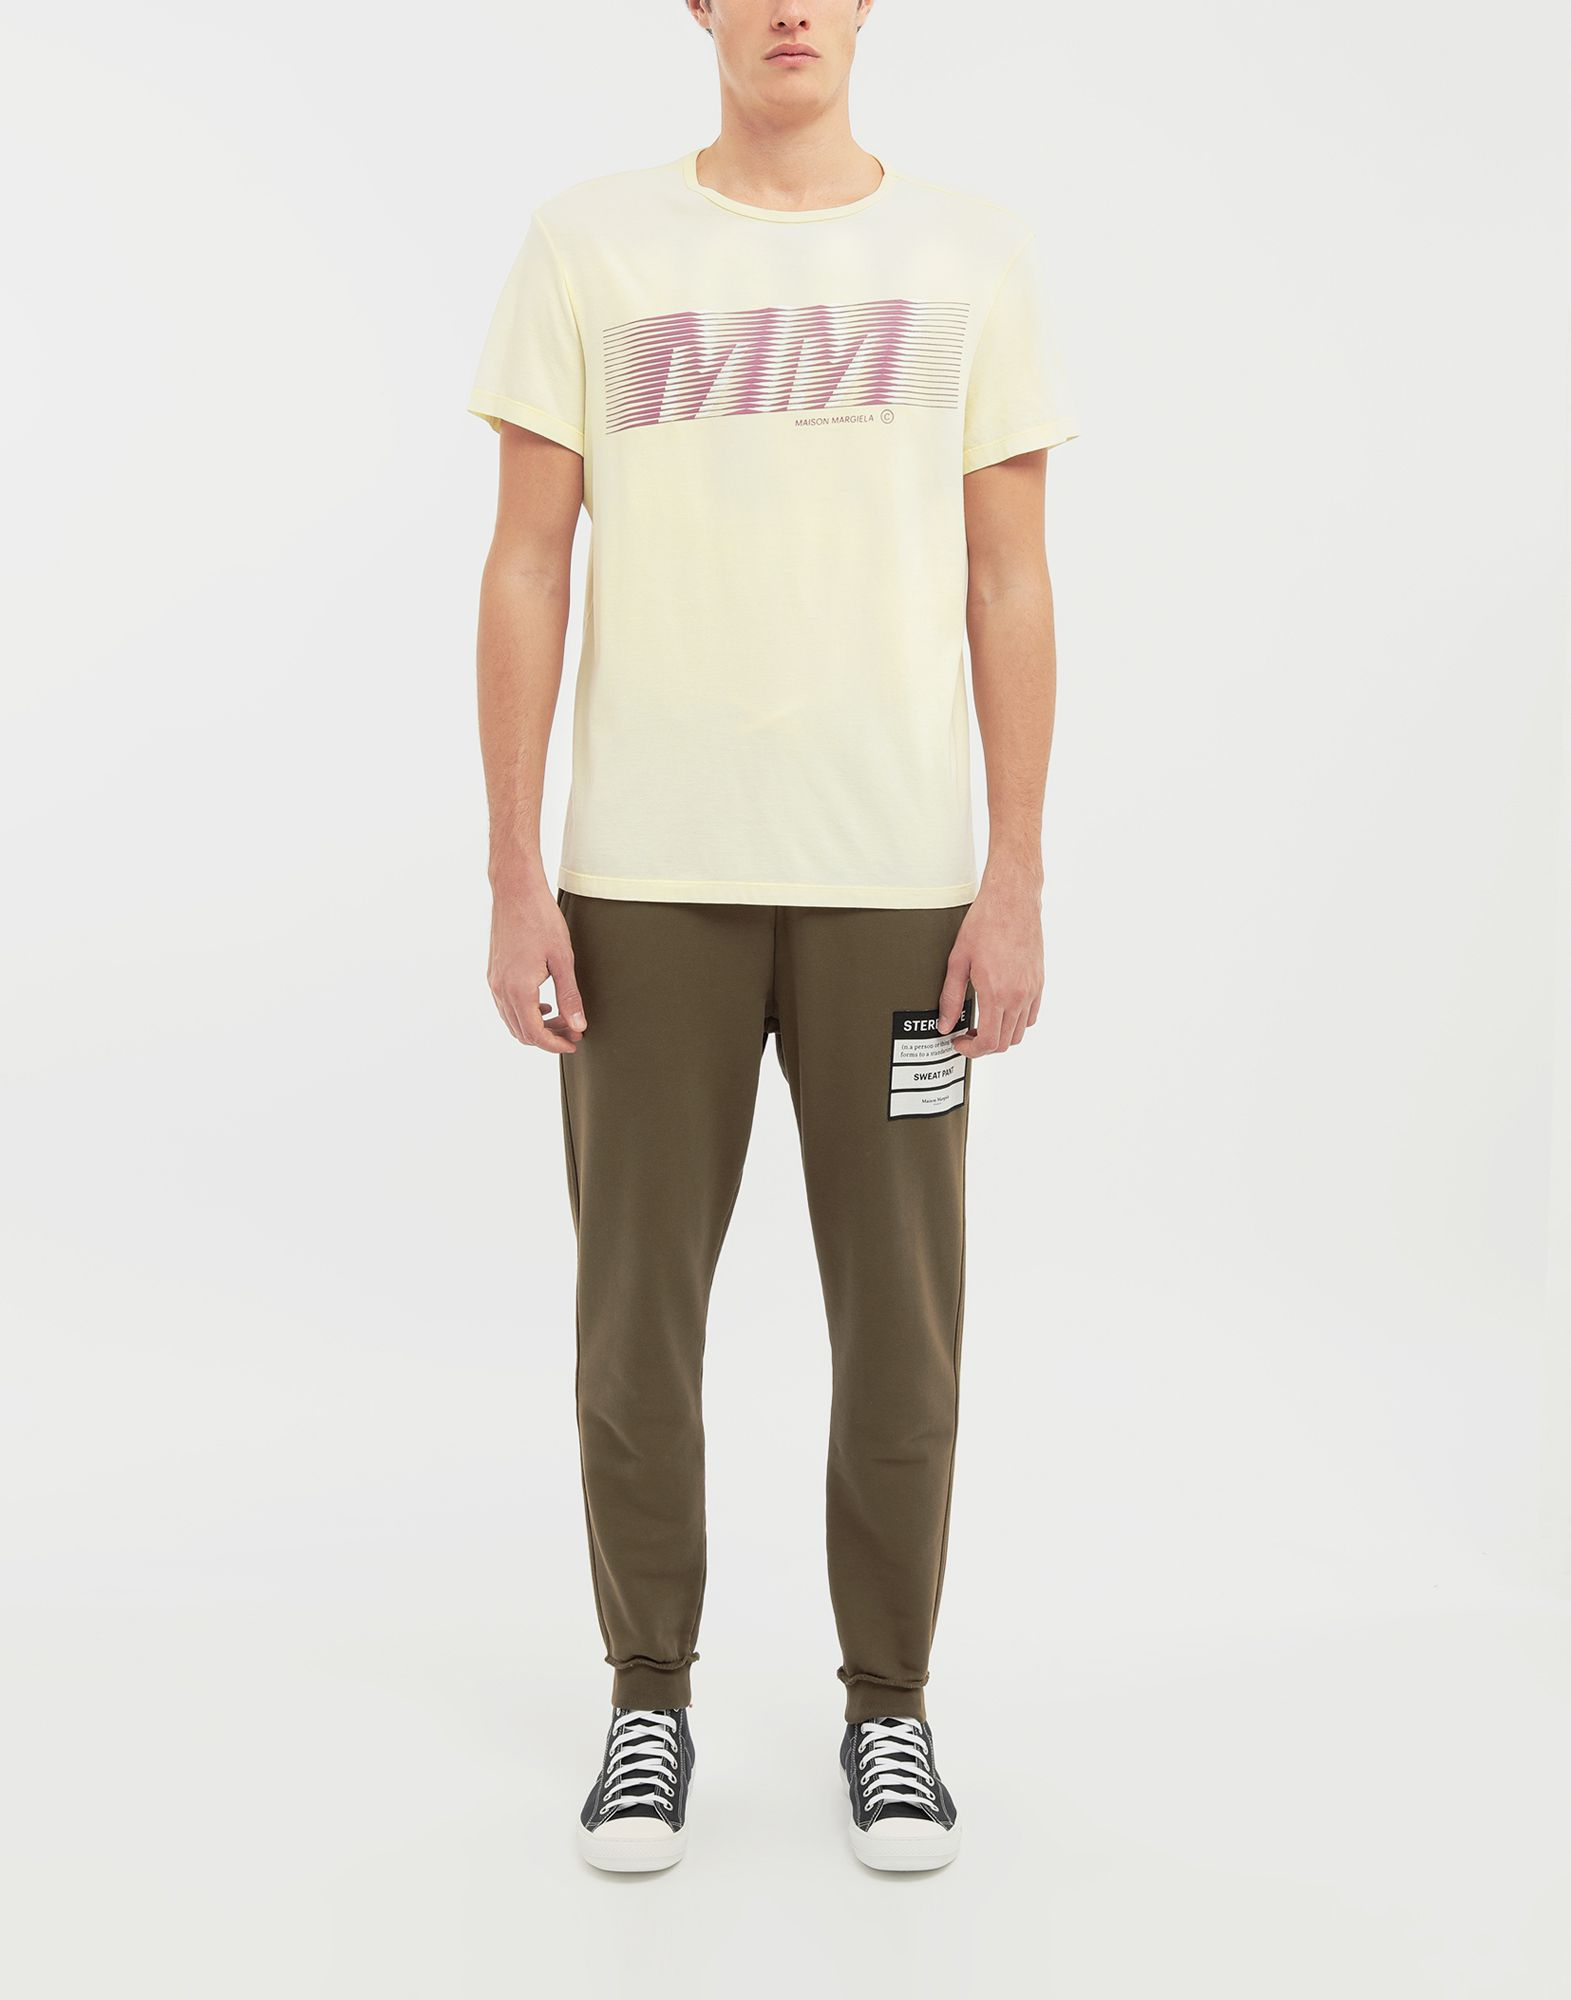 MAISON MARGIELA MM logo print T-shirt Short sleeve t-shirt Man d